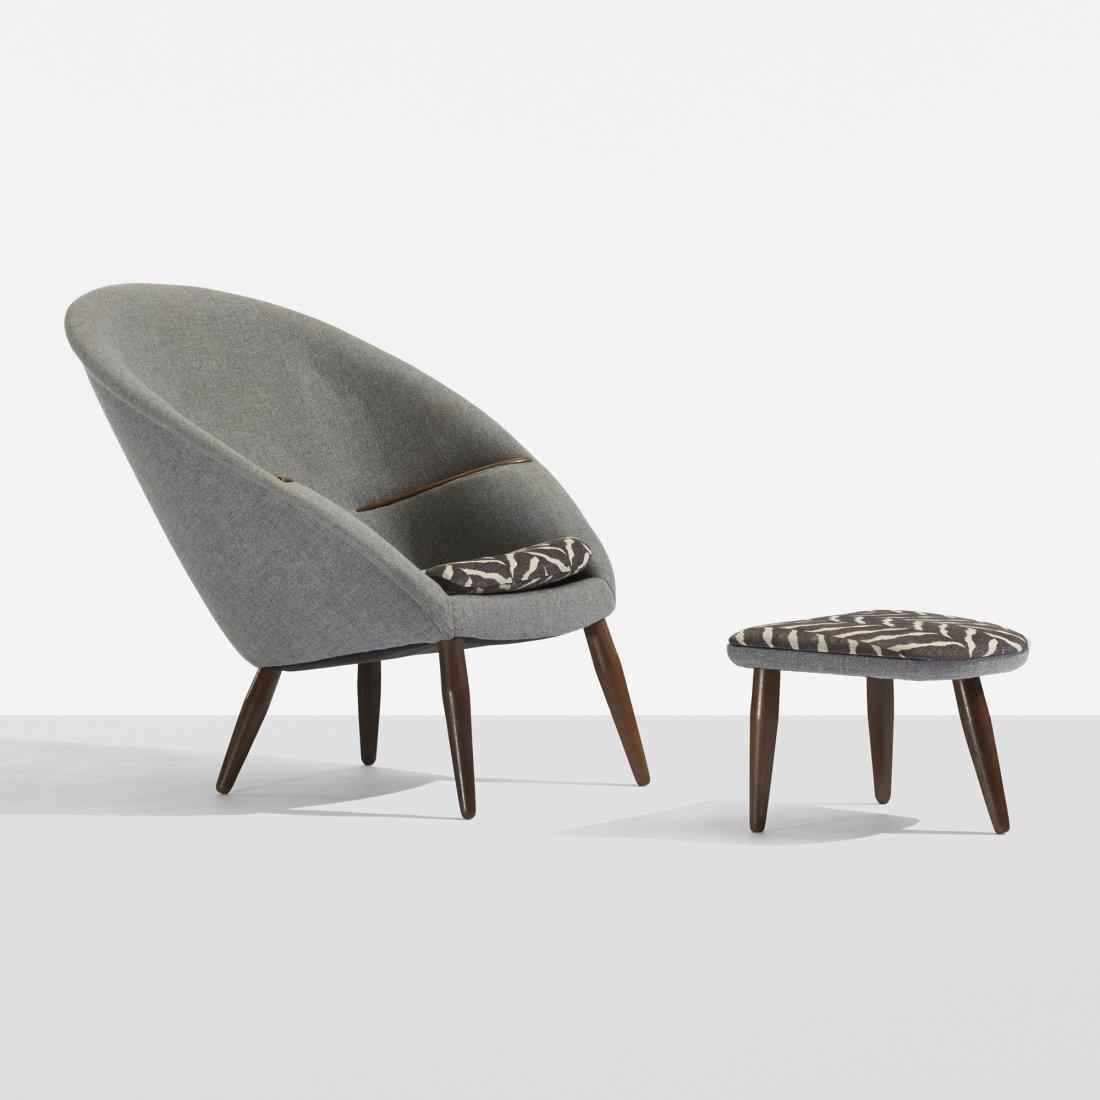 Nanna and Jørgen Ditzel lounge chair and ottoman